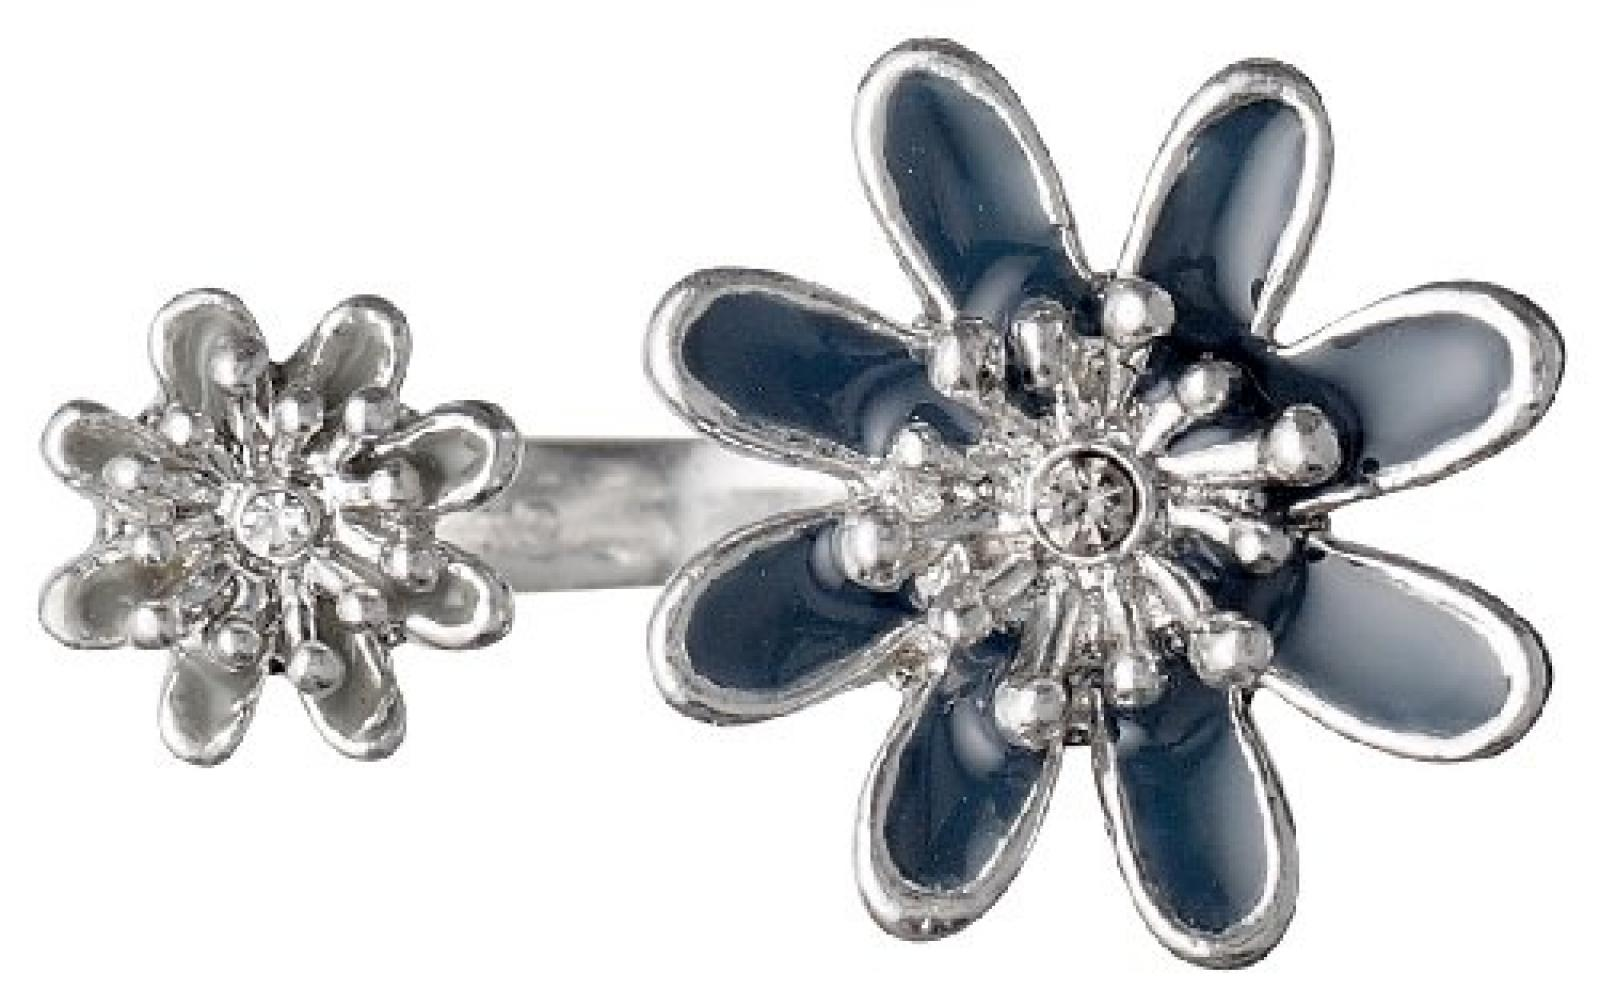 Pilgrim Jewelry Damen-Ring Messing Pilgrim Damen-Ring aus der Serie Flower Rosa versilbert,blau  1.8 cm 241336204